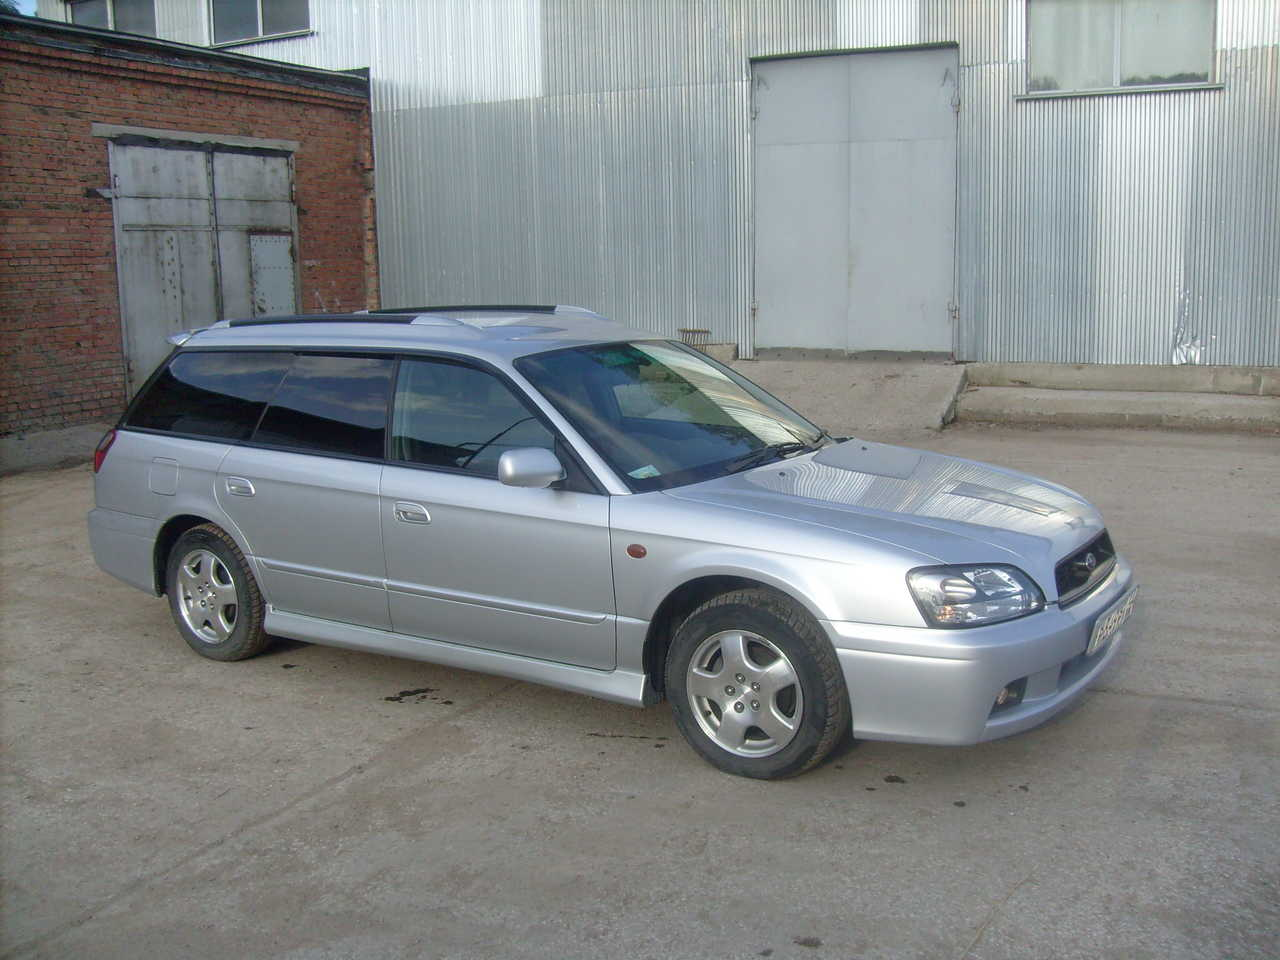 used 2002 subaru legacy wagon photos 2000cc gasoline automatic for sale. Black Bedroom Furniture Sets. Home Design Ideas